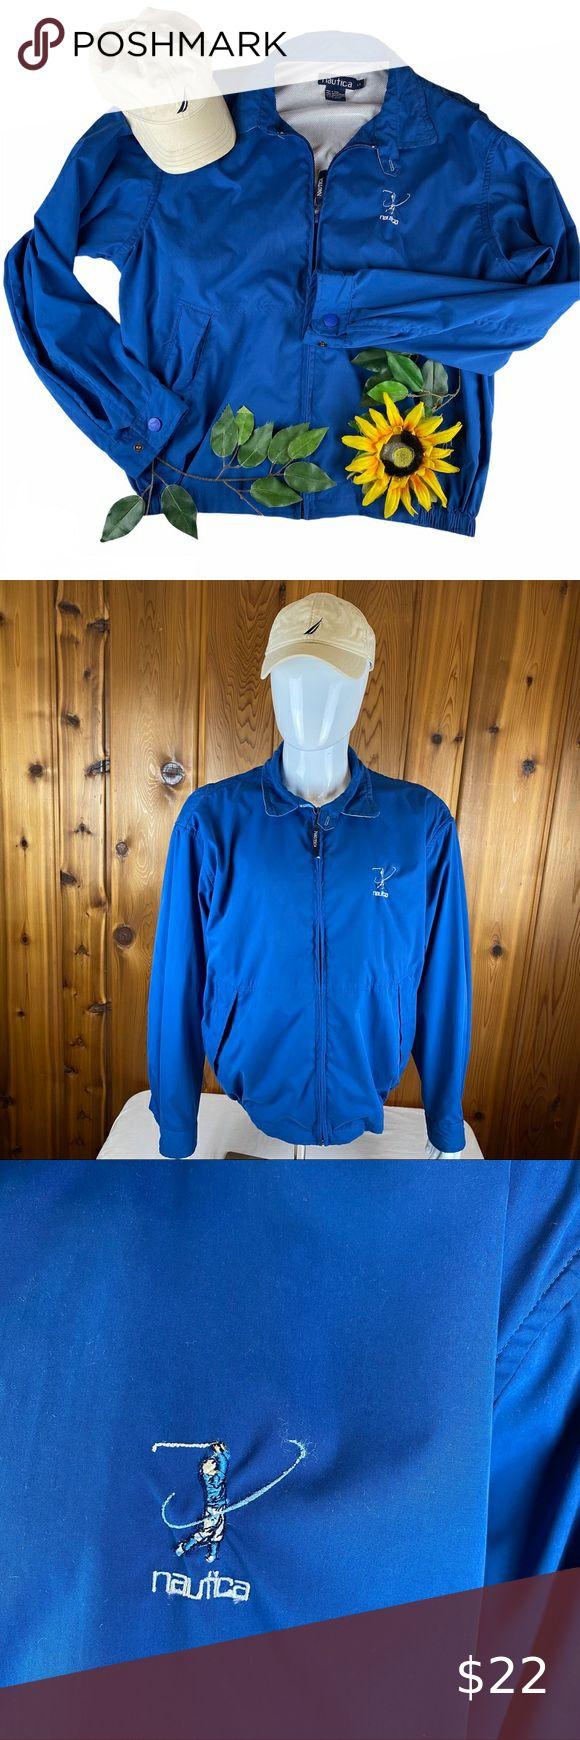 Nautica Mens Golf Swing Windbreaker Jacket Mesh Nautica Mens Golf Swing Windbreaker Jacket Blue Solid Mesh Pockets Coll In 2020 Golf Swing Windbreaker Jacket Mens Golf [ 1740 x 580 Pixel ]